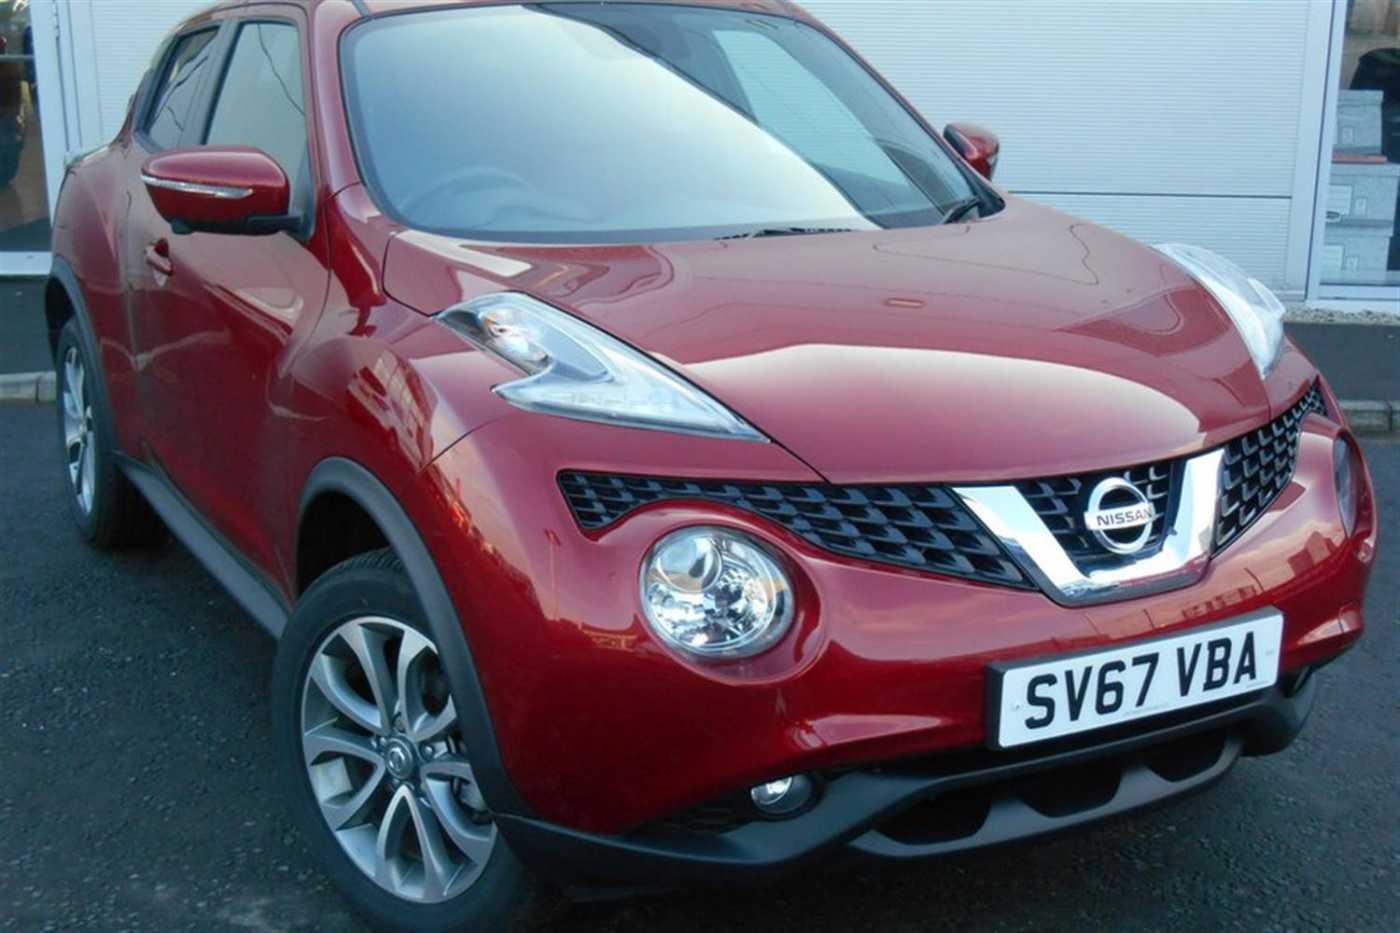 Nissan Juke │Red│for Sale in Aberdeen│Nissan Used Cars UK MDX-HKBMYP2